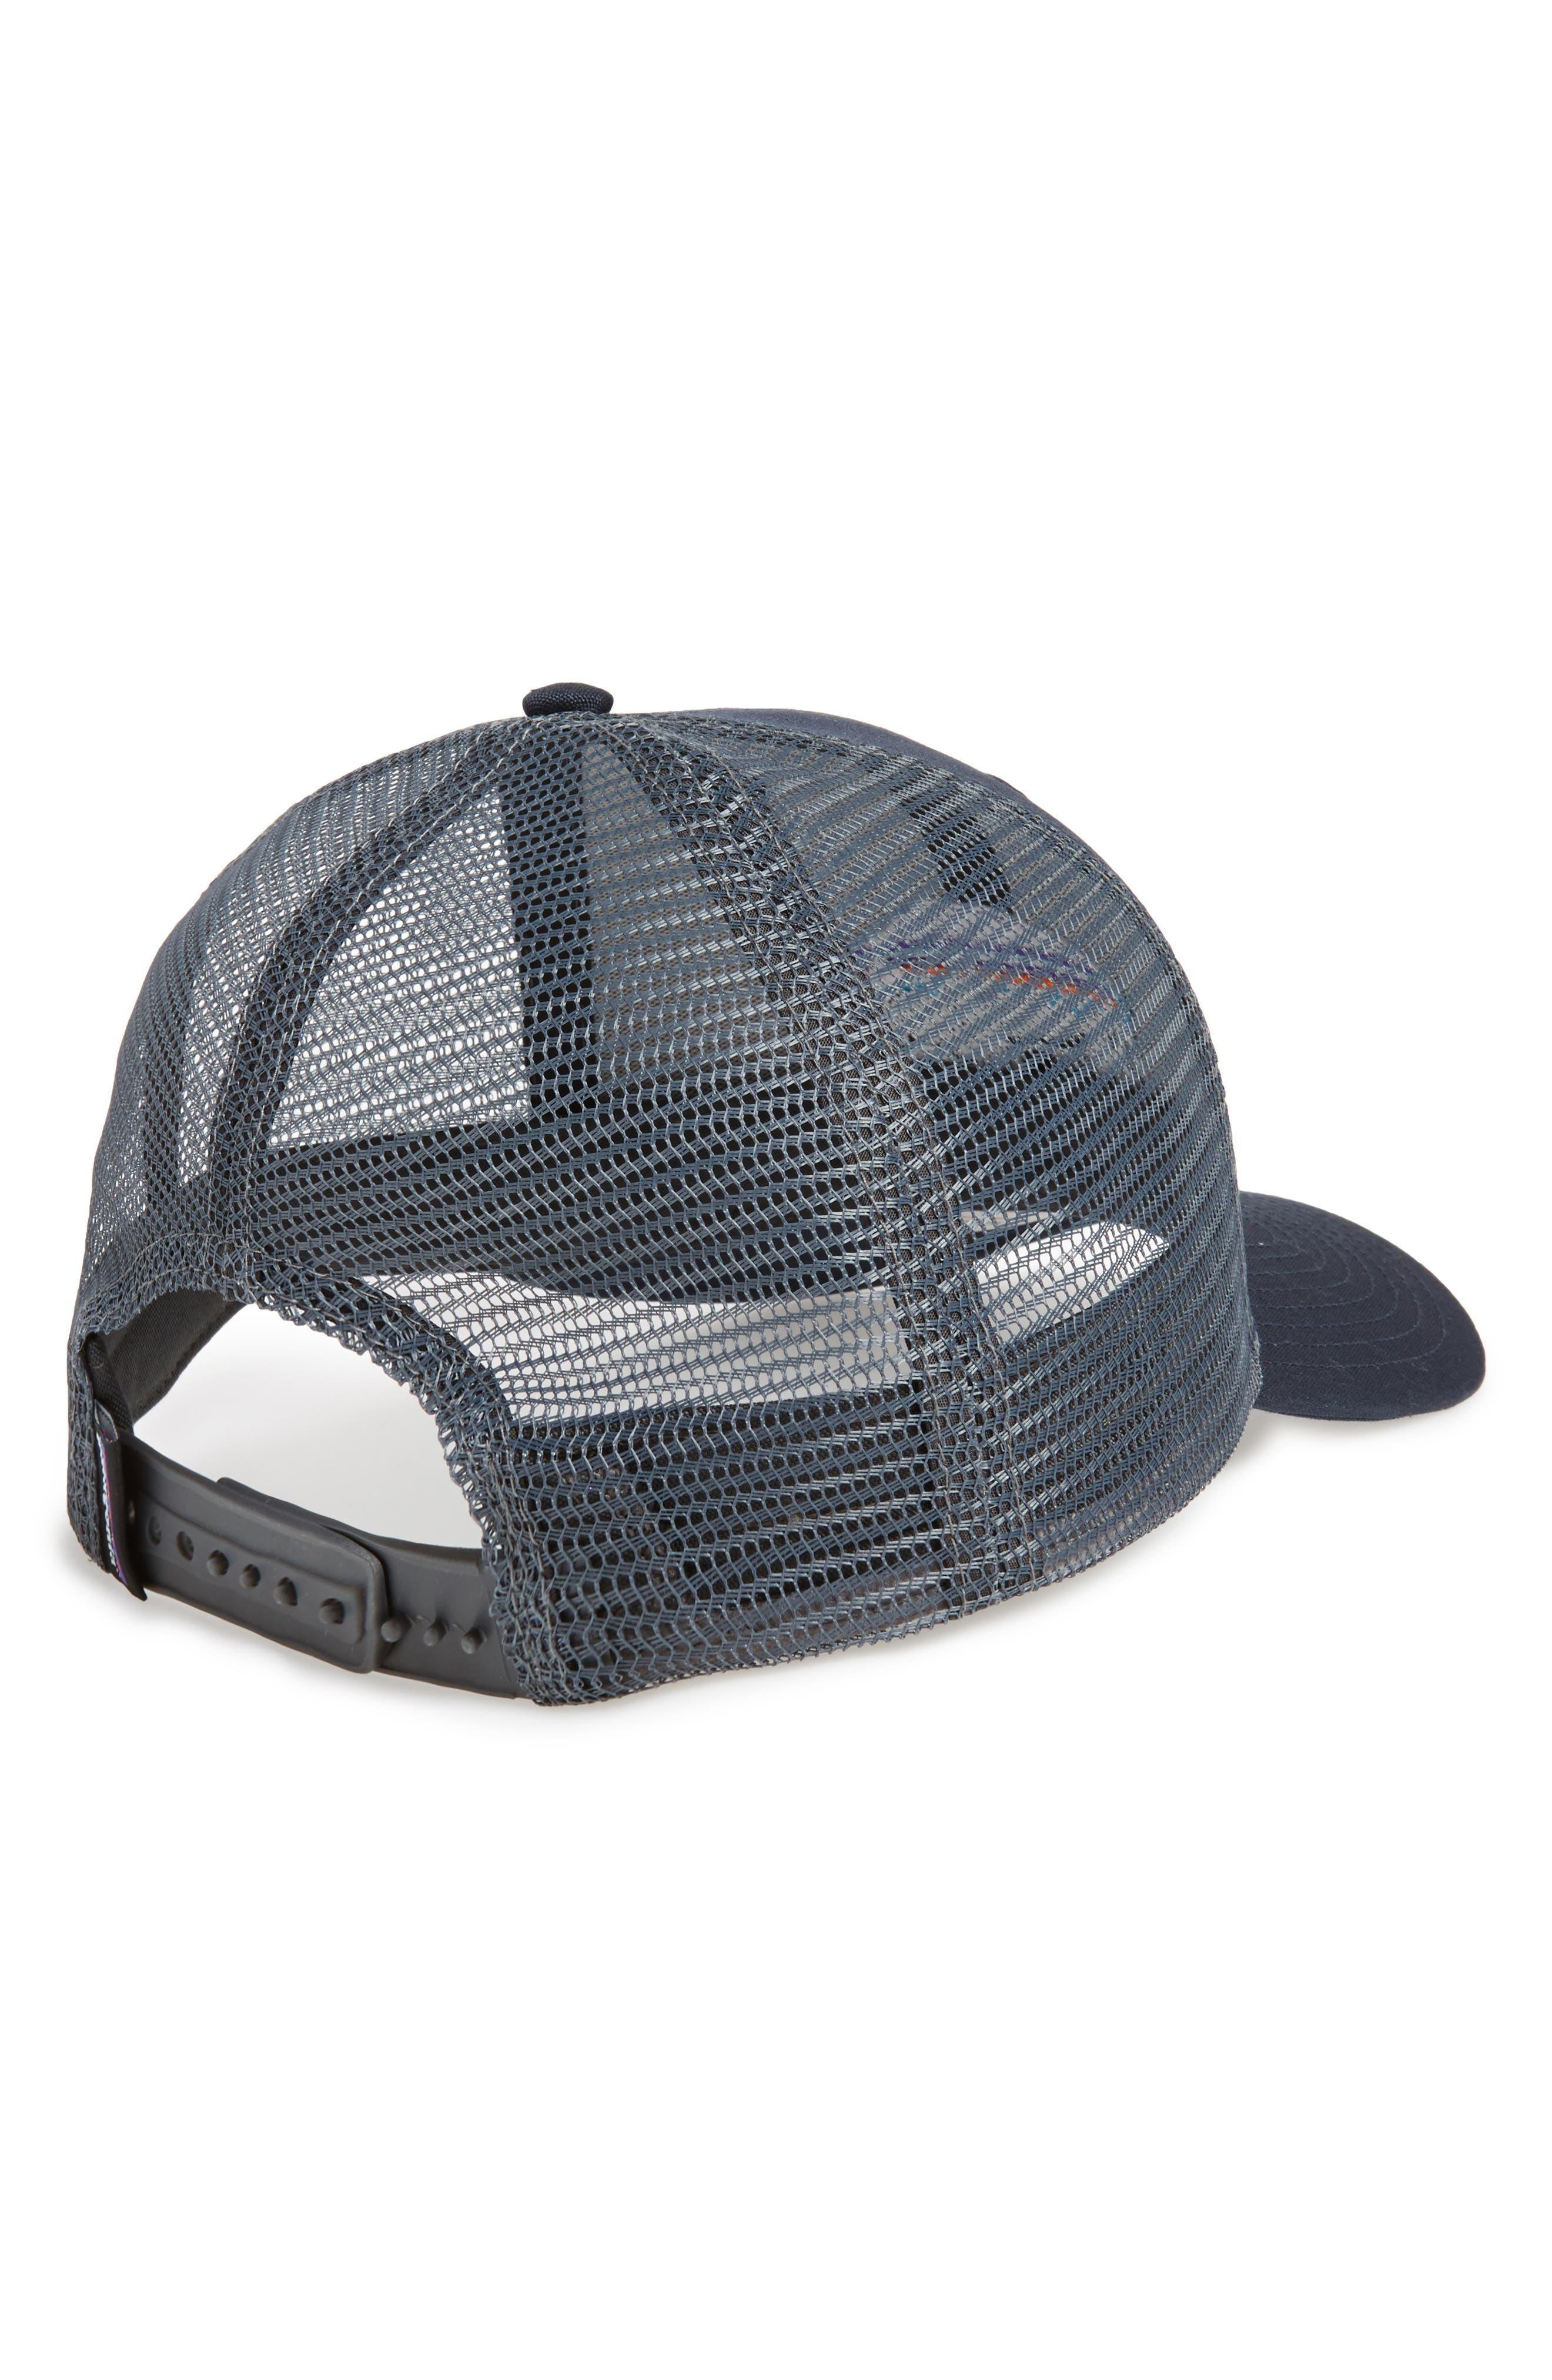 'Fitz Roy Bison' Trucker Hat,                             Alternate thumbnail 2, color,                             Navy Blue